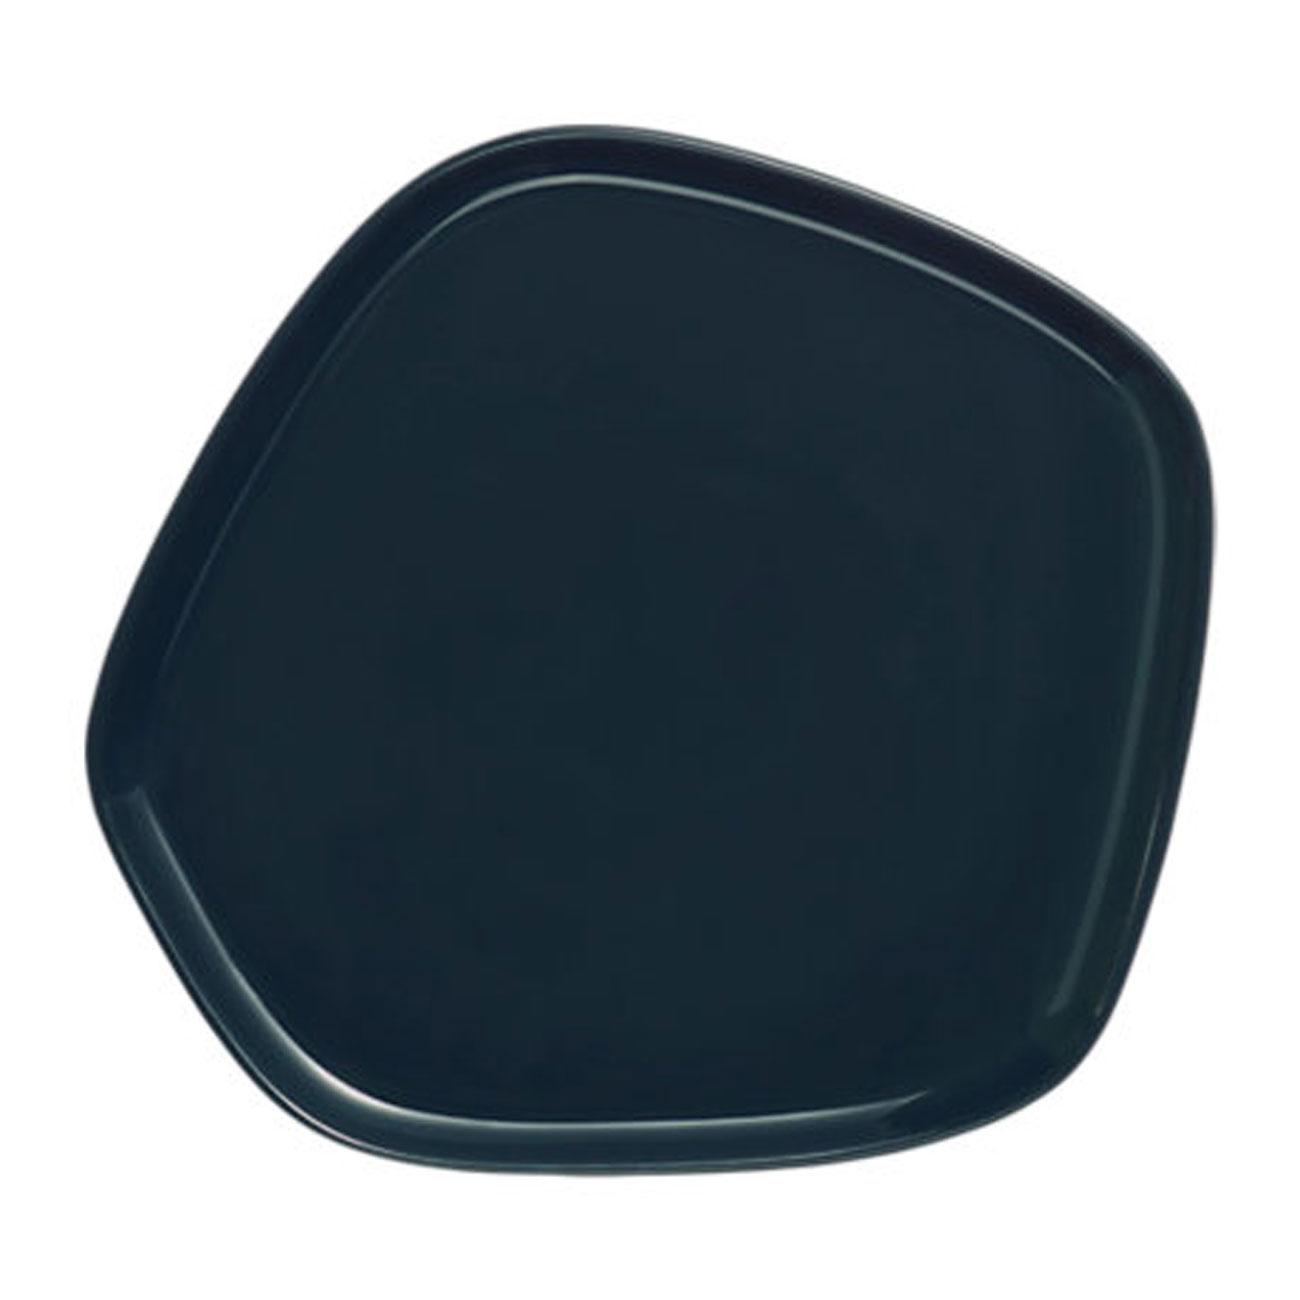 iittala X Issey Miyake plate black